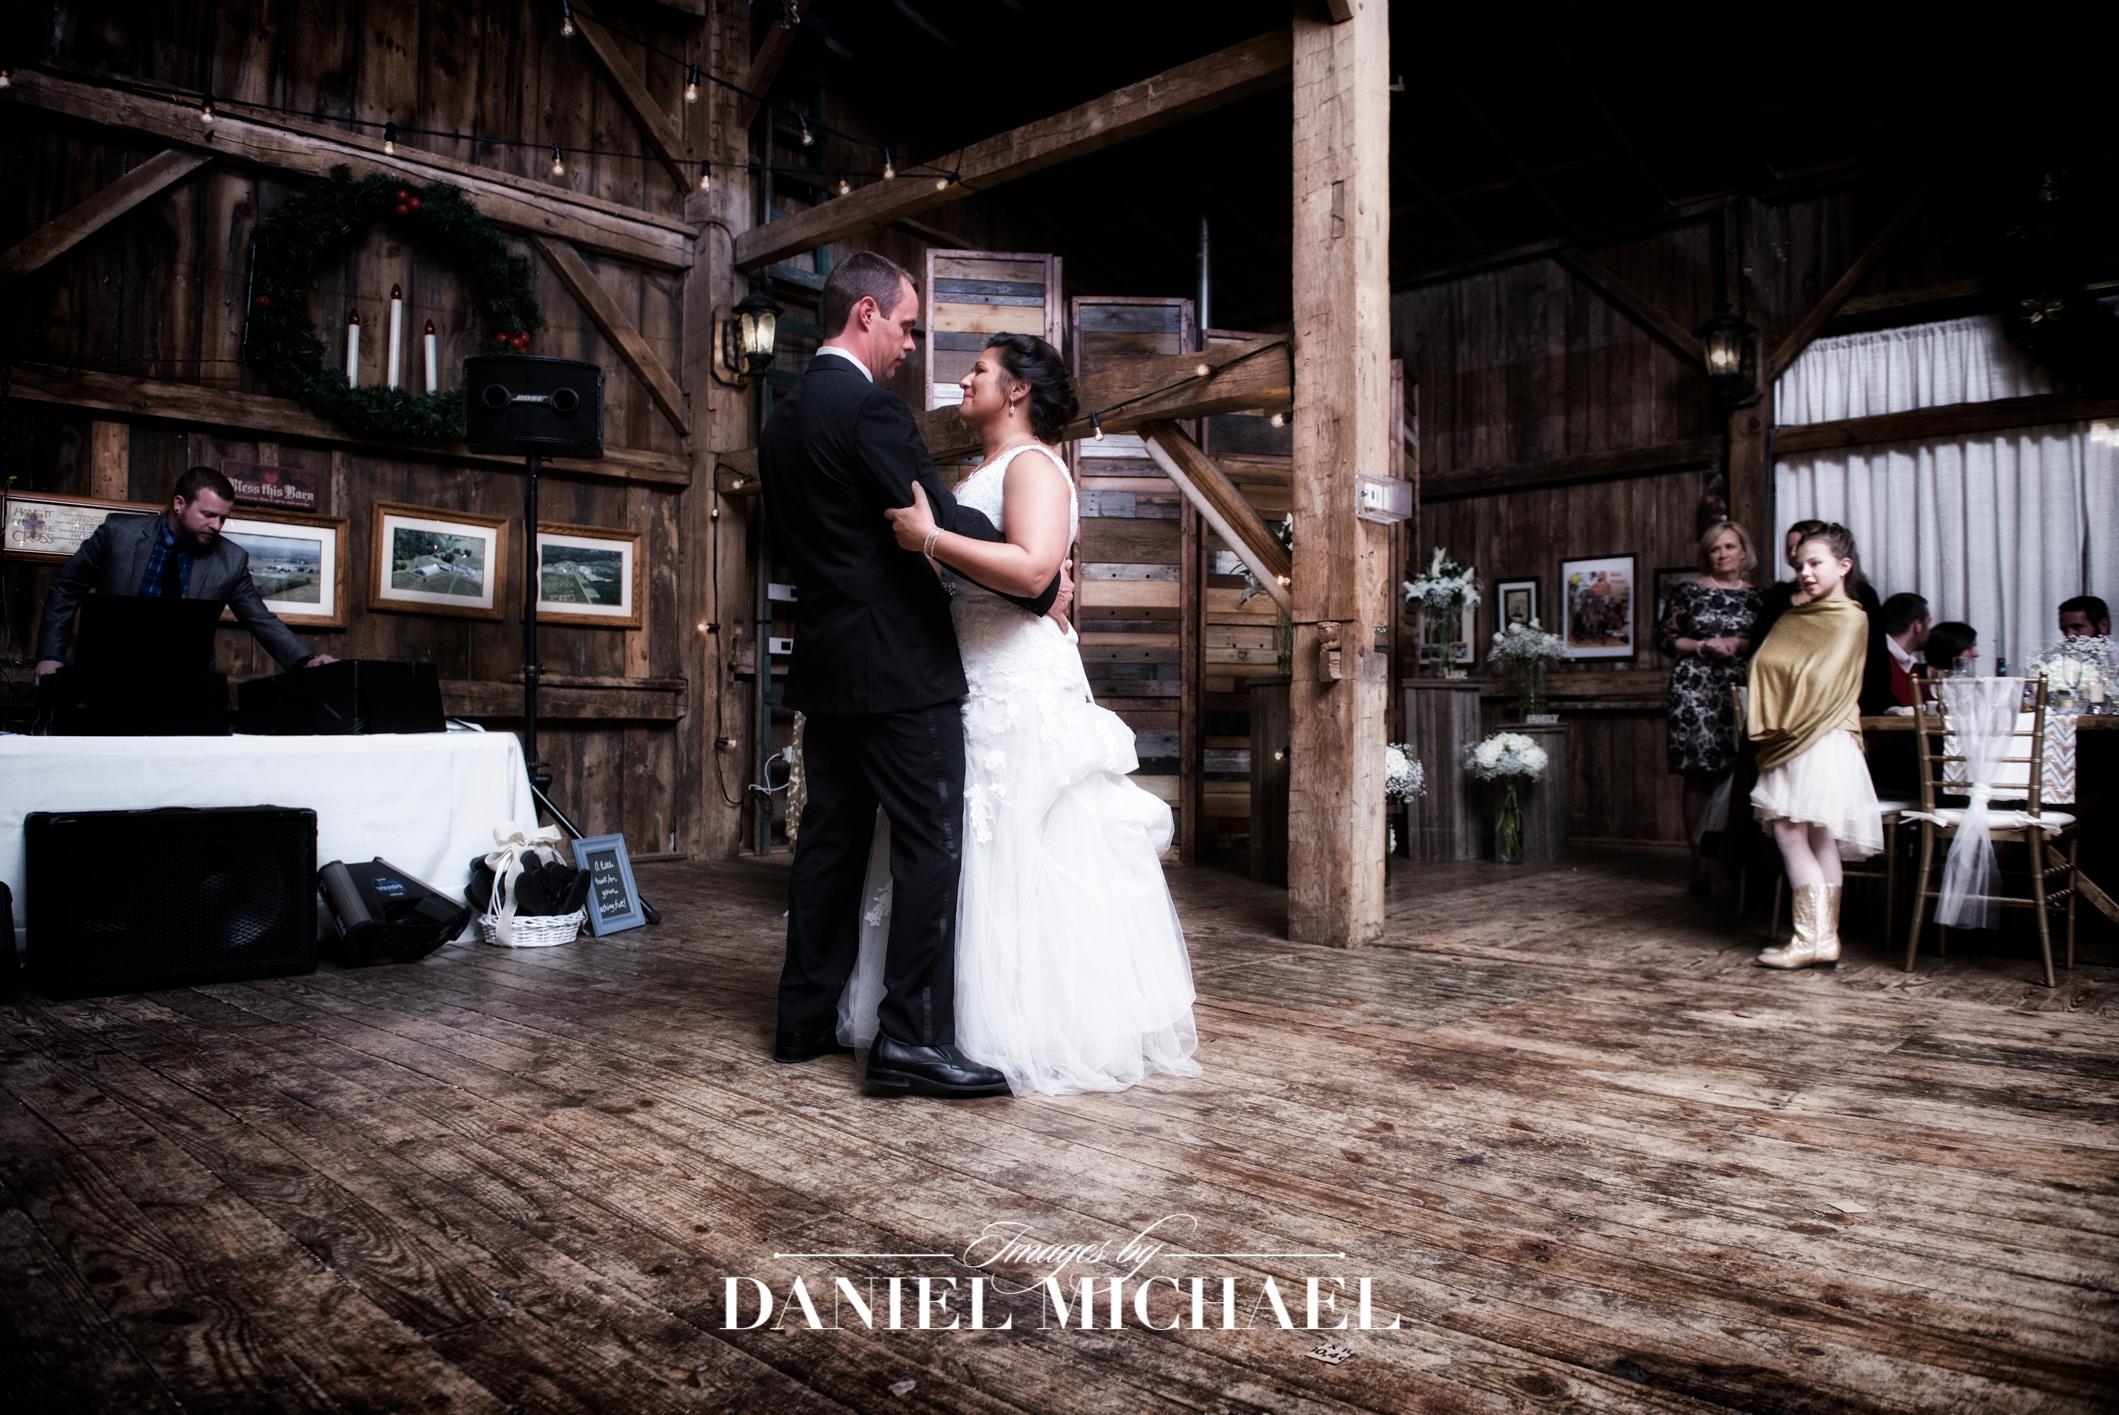 Niederman Farm Wedding Venue Reception Ceremony Photographer